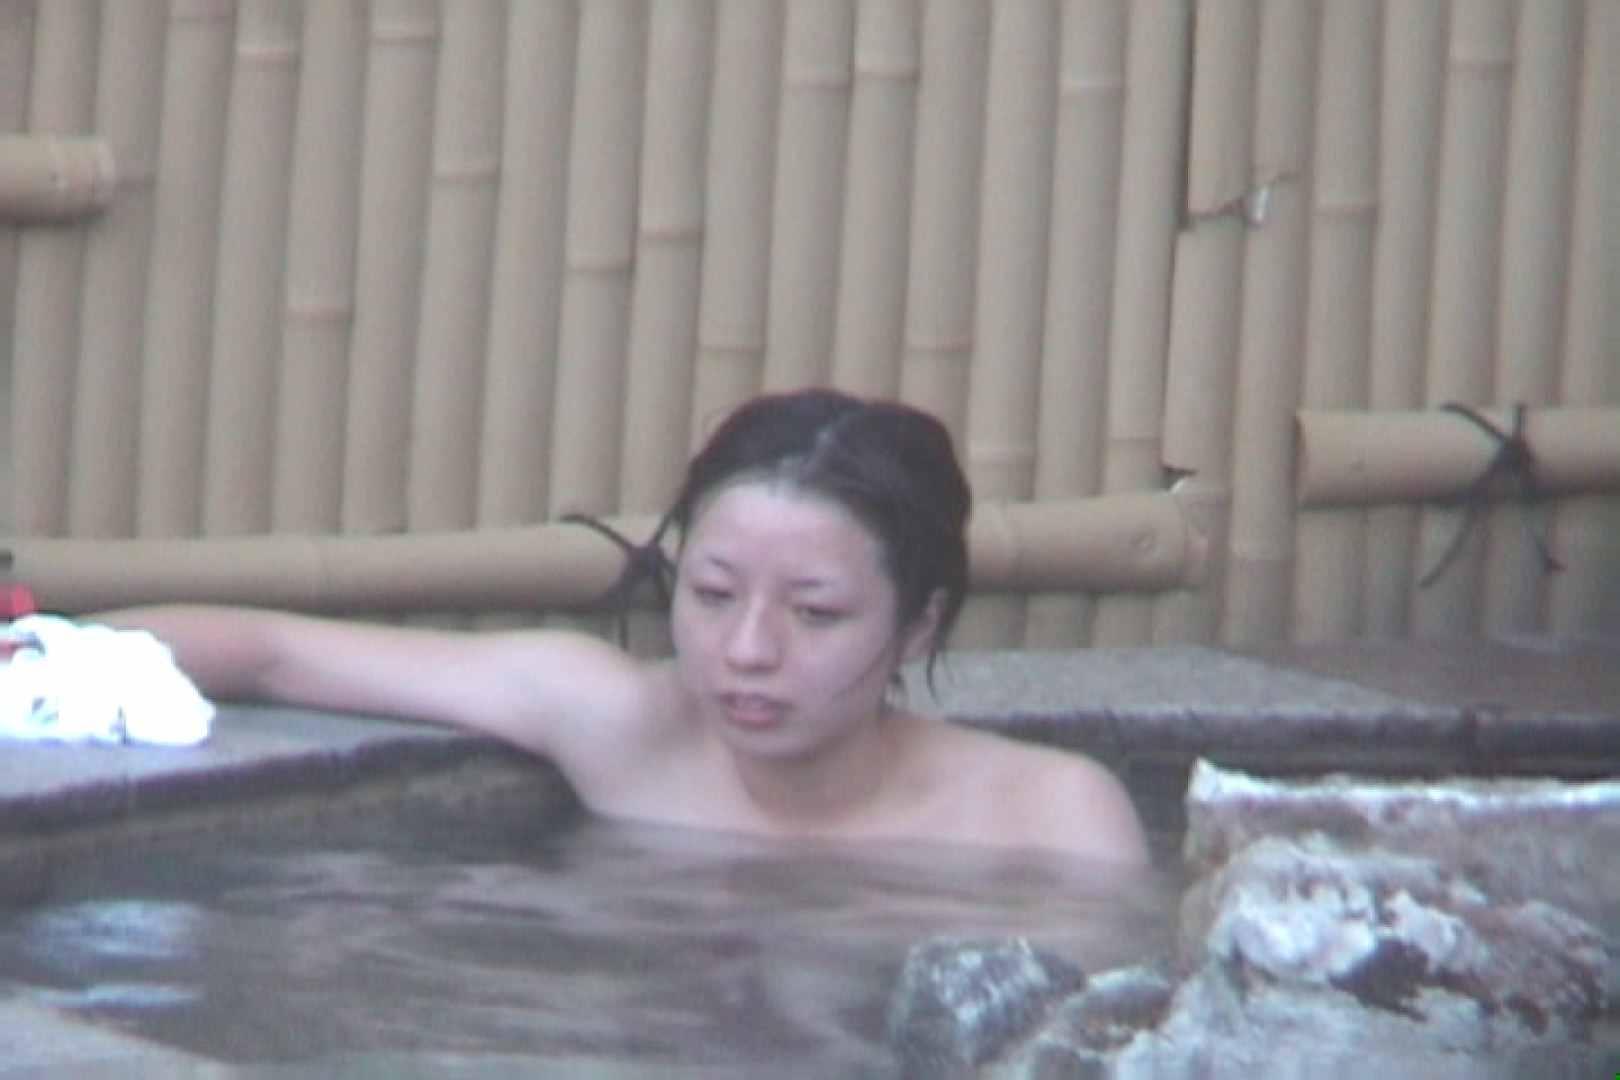 Aquaな露天風呂Vol.608 HなOL | 盗撮  89pic 50